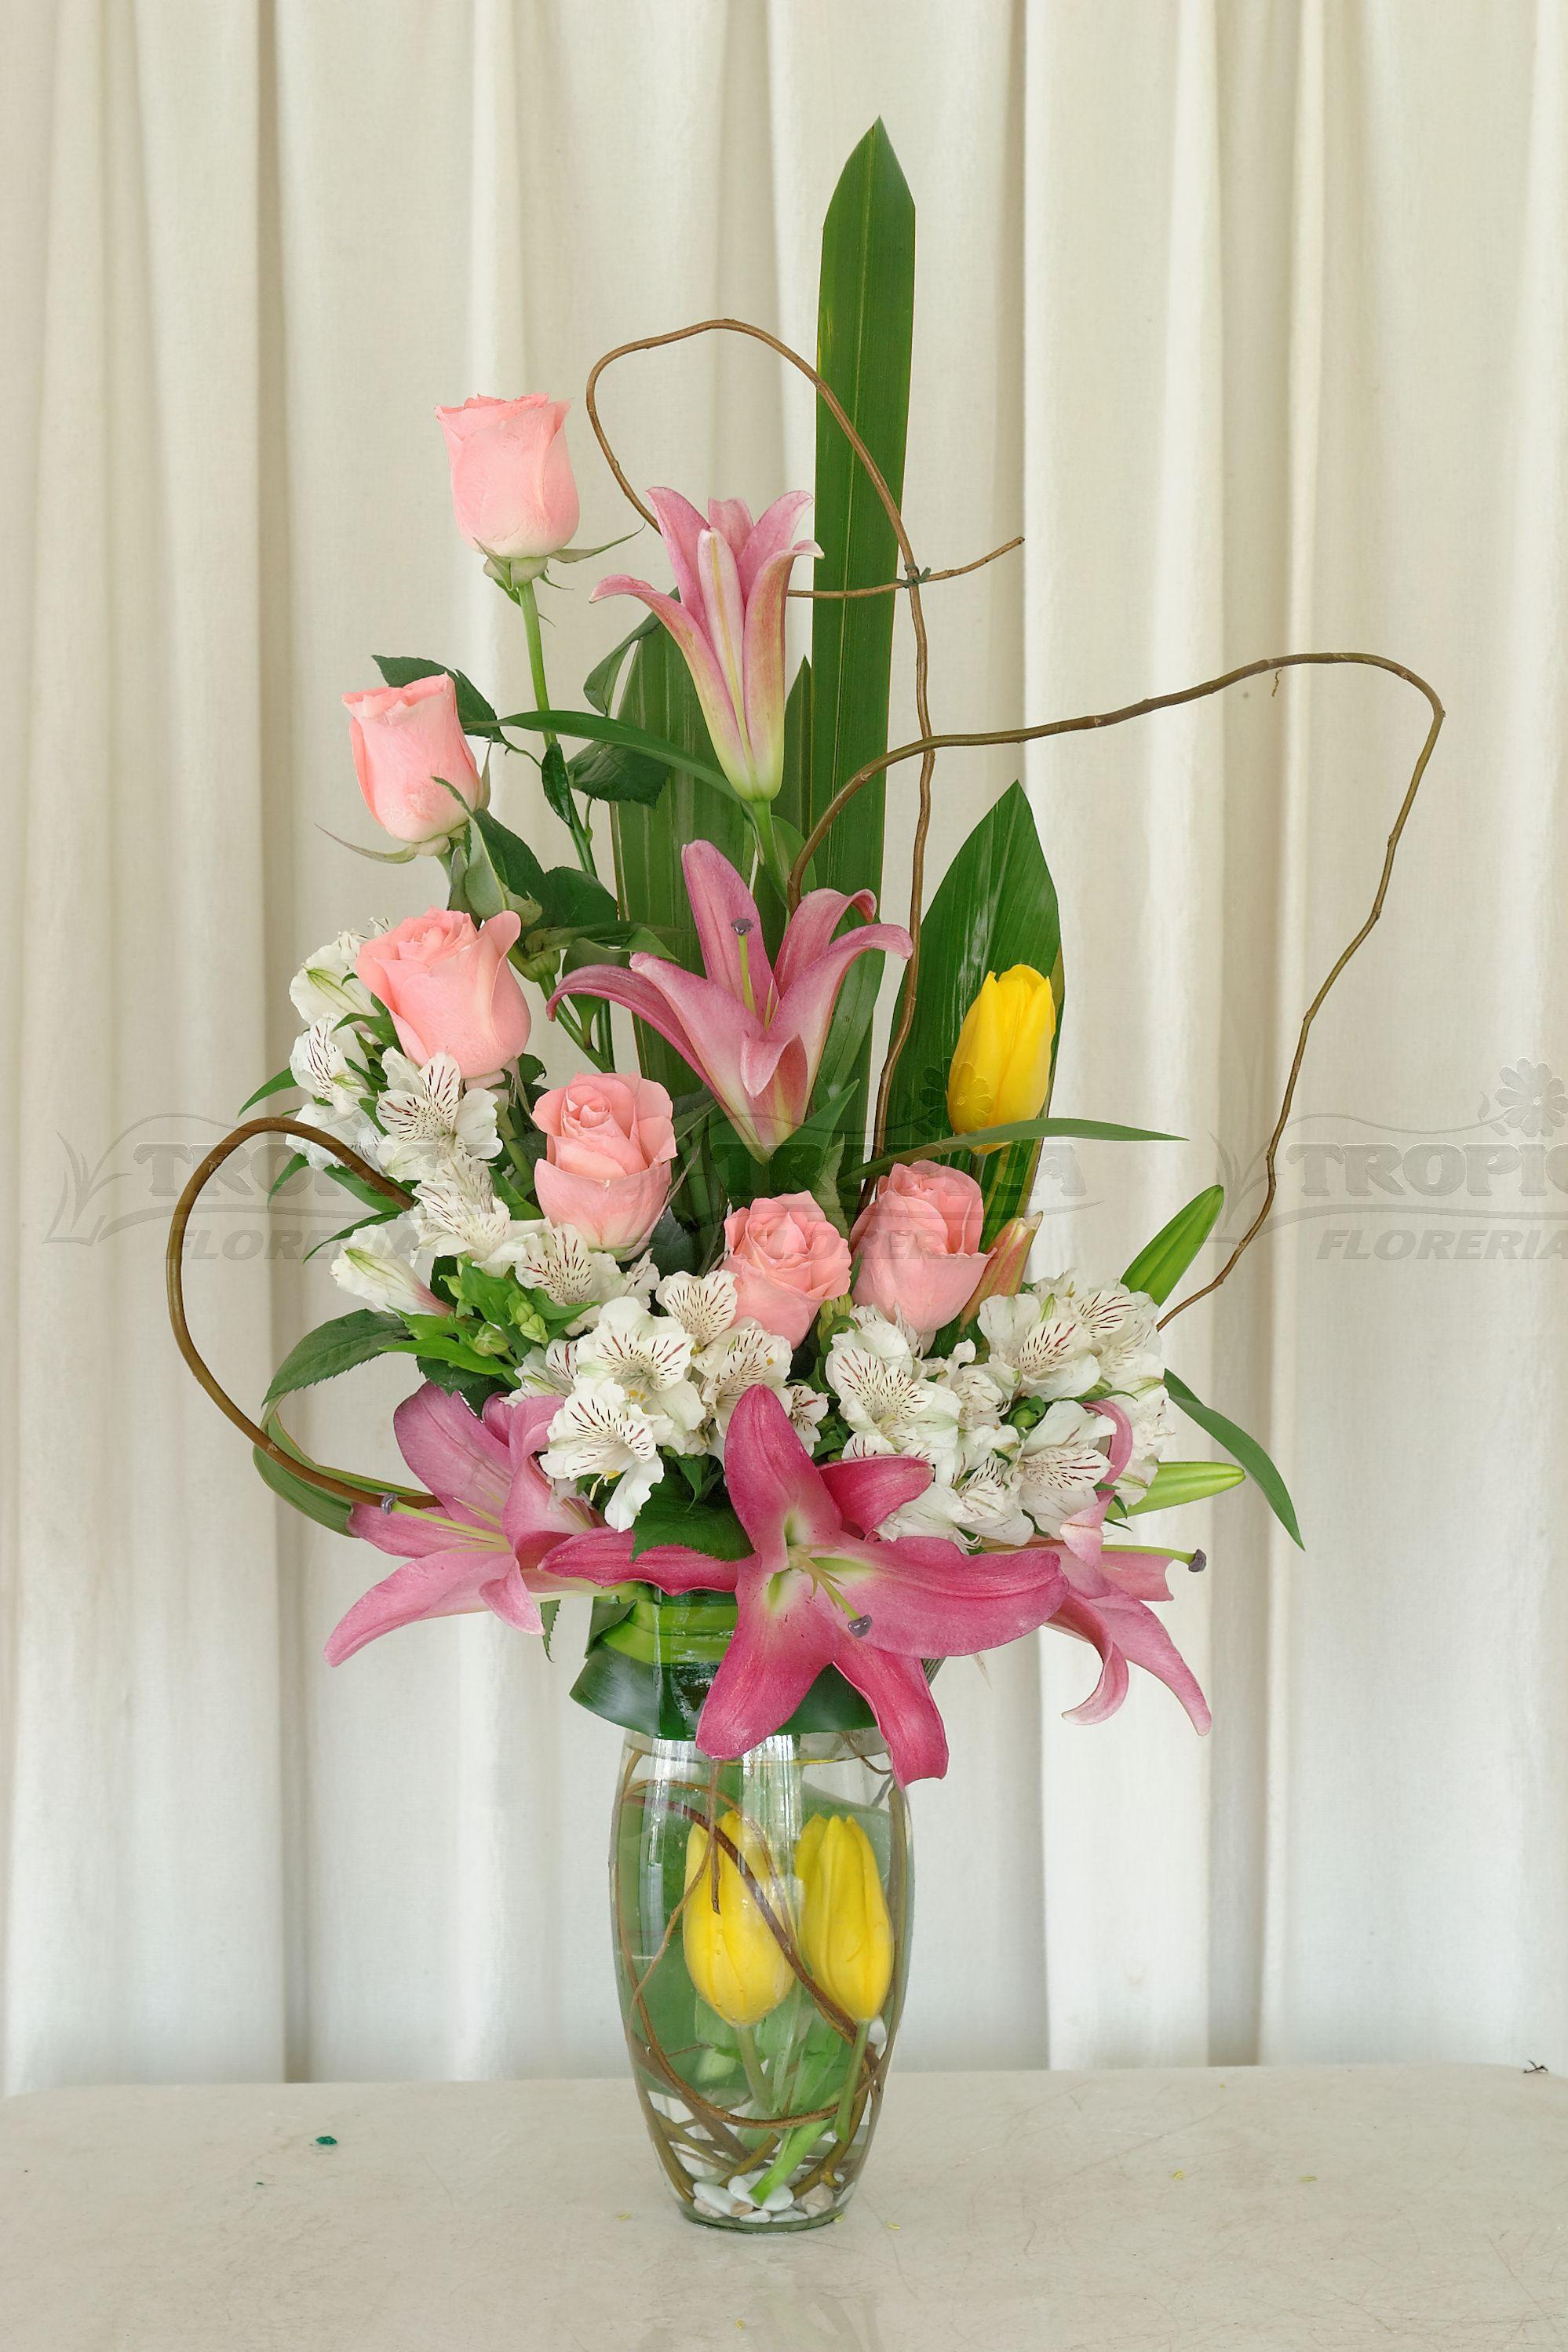 Arreglo Mixto Floreria Tropica Flower Arrangements Pinterest